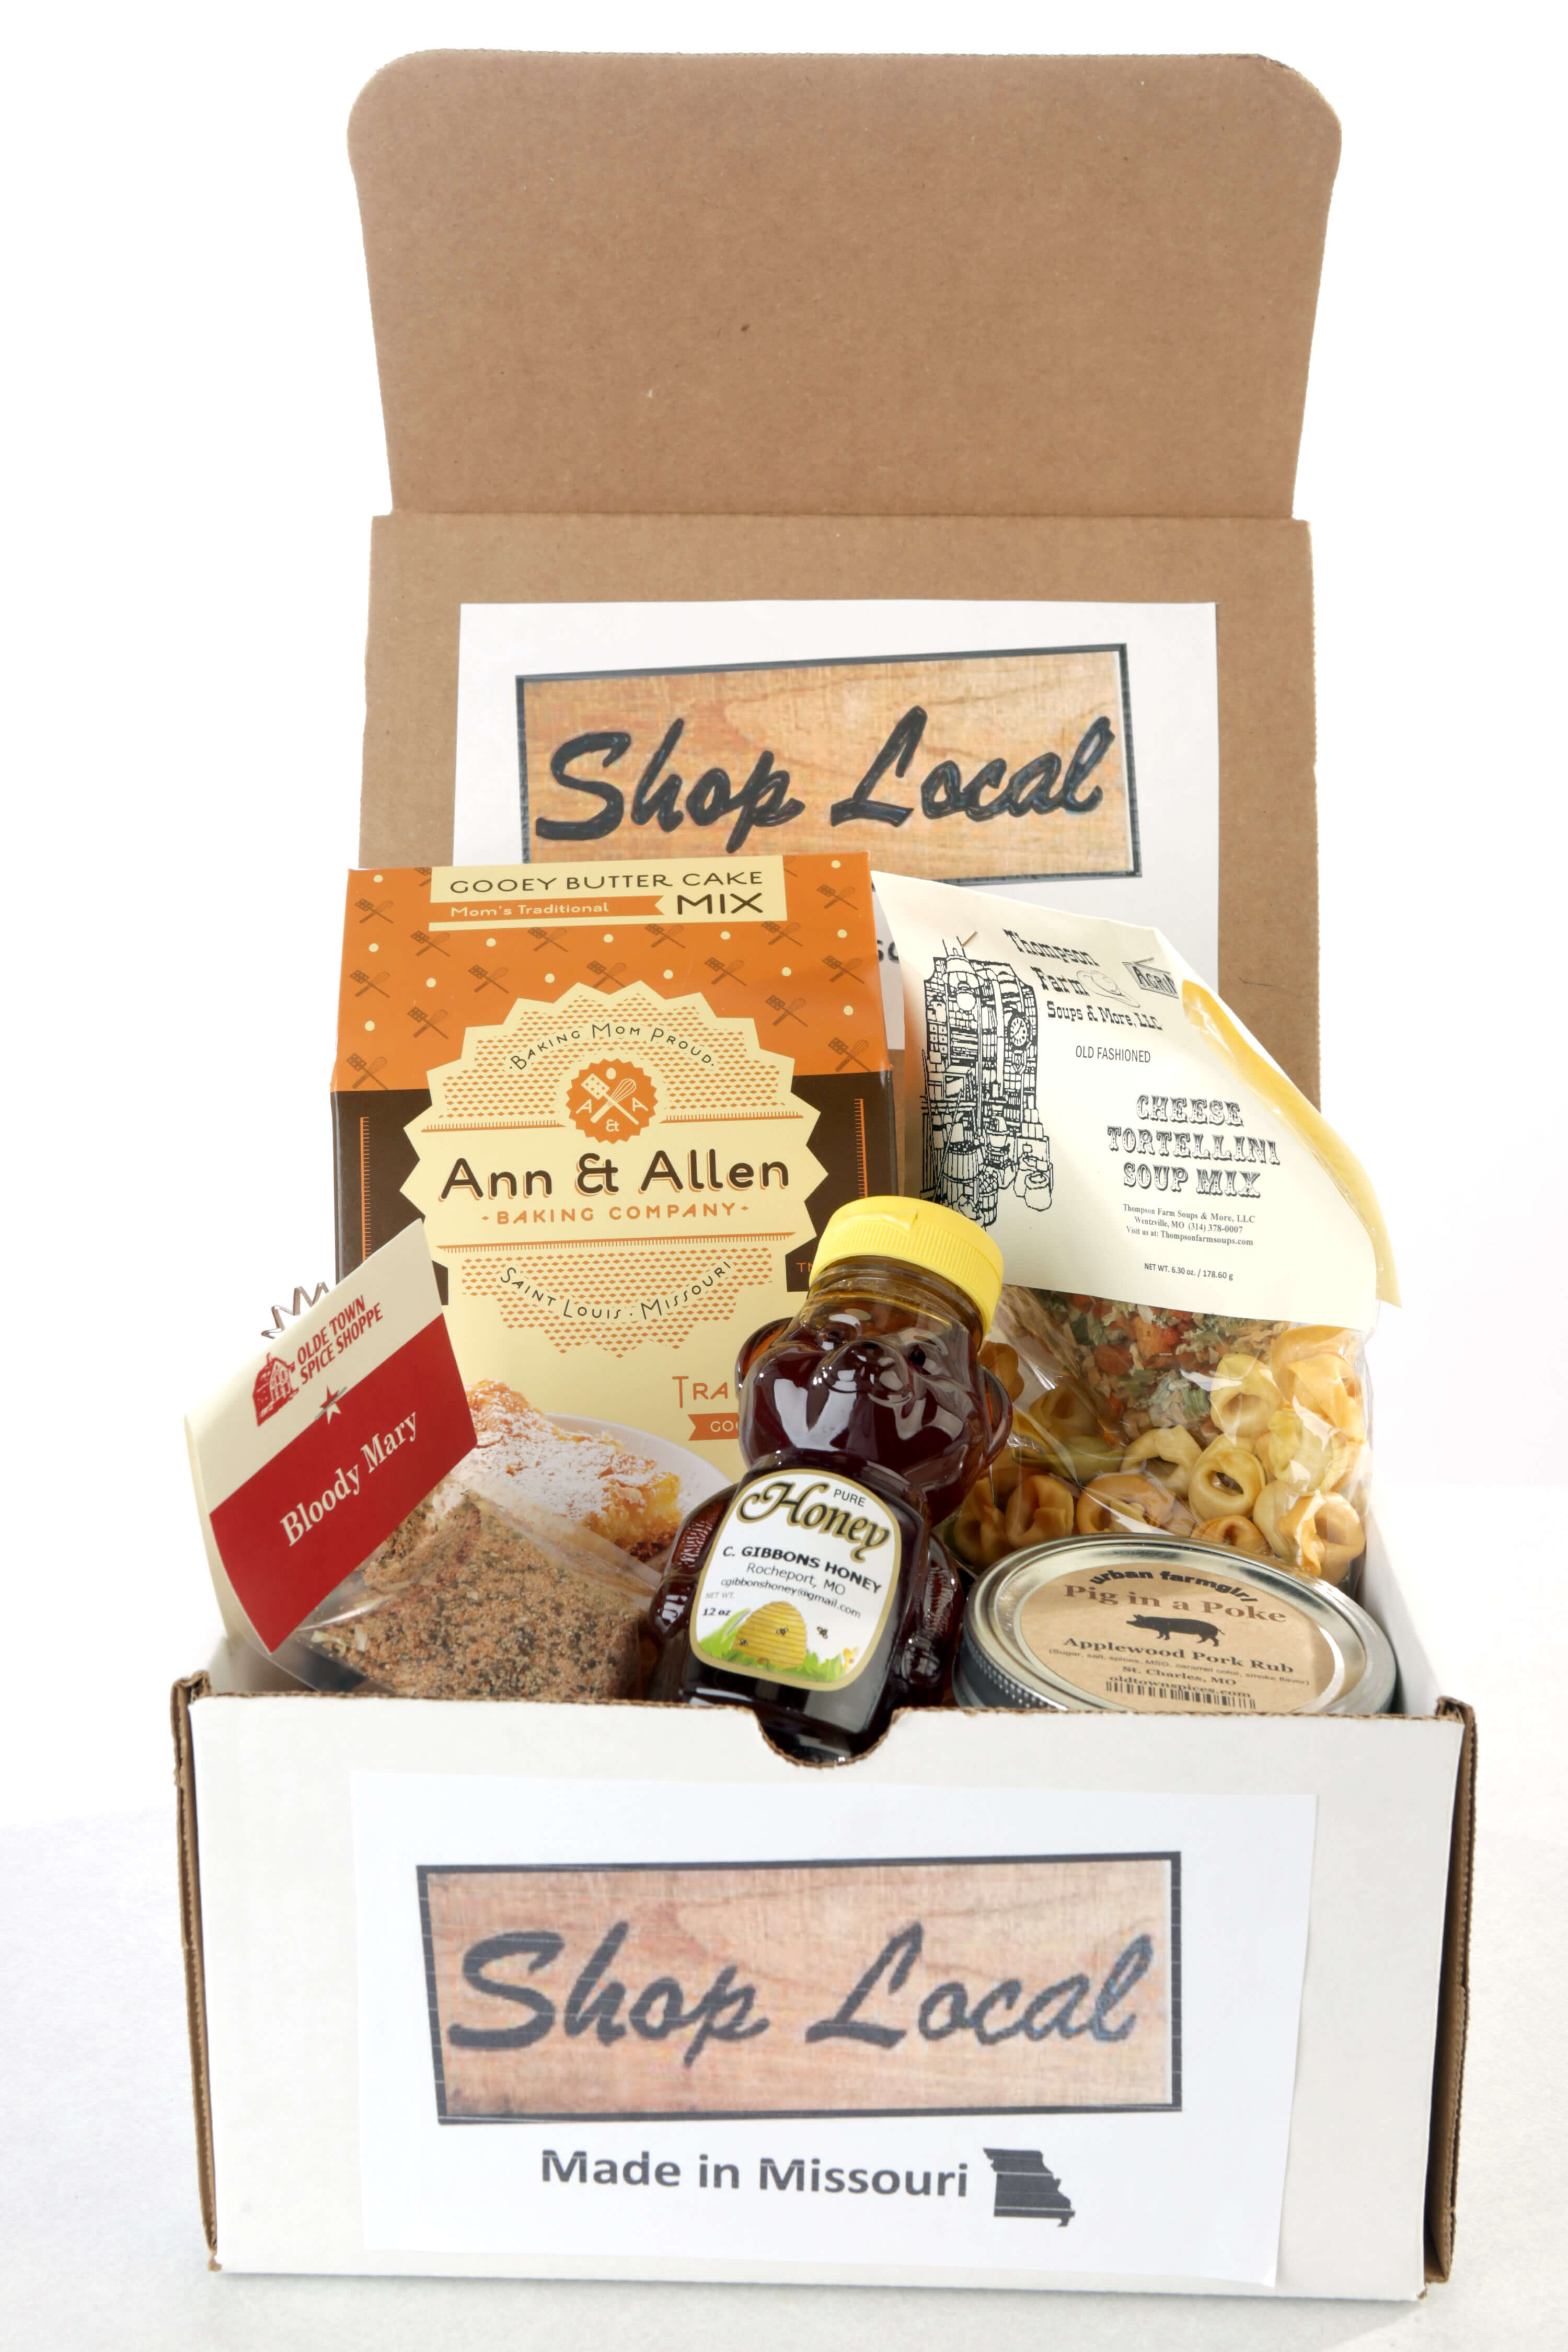 Shop Local gift box